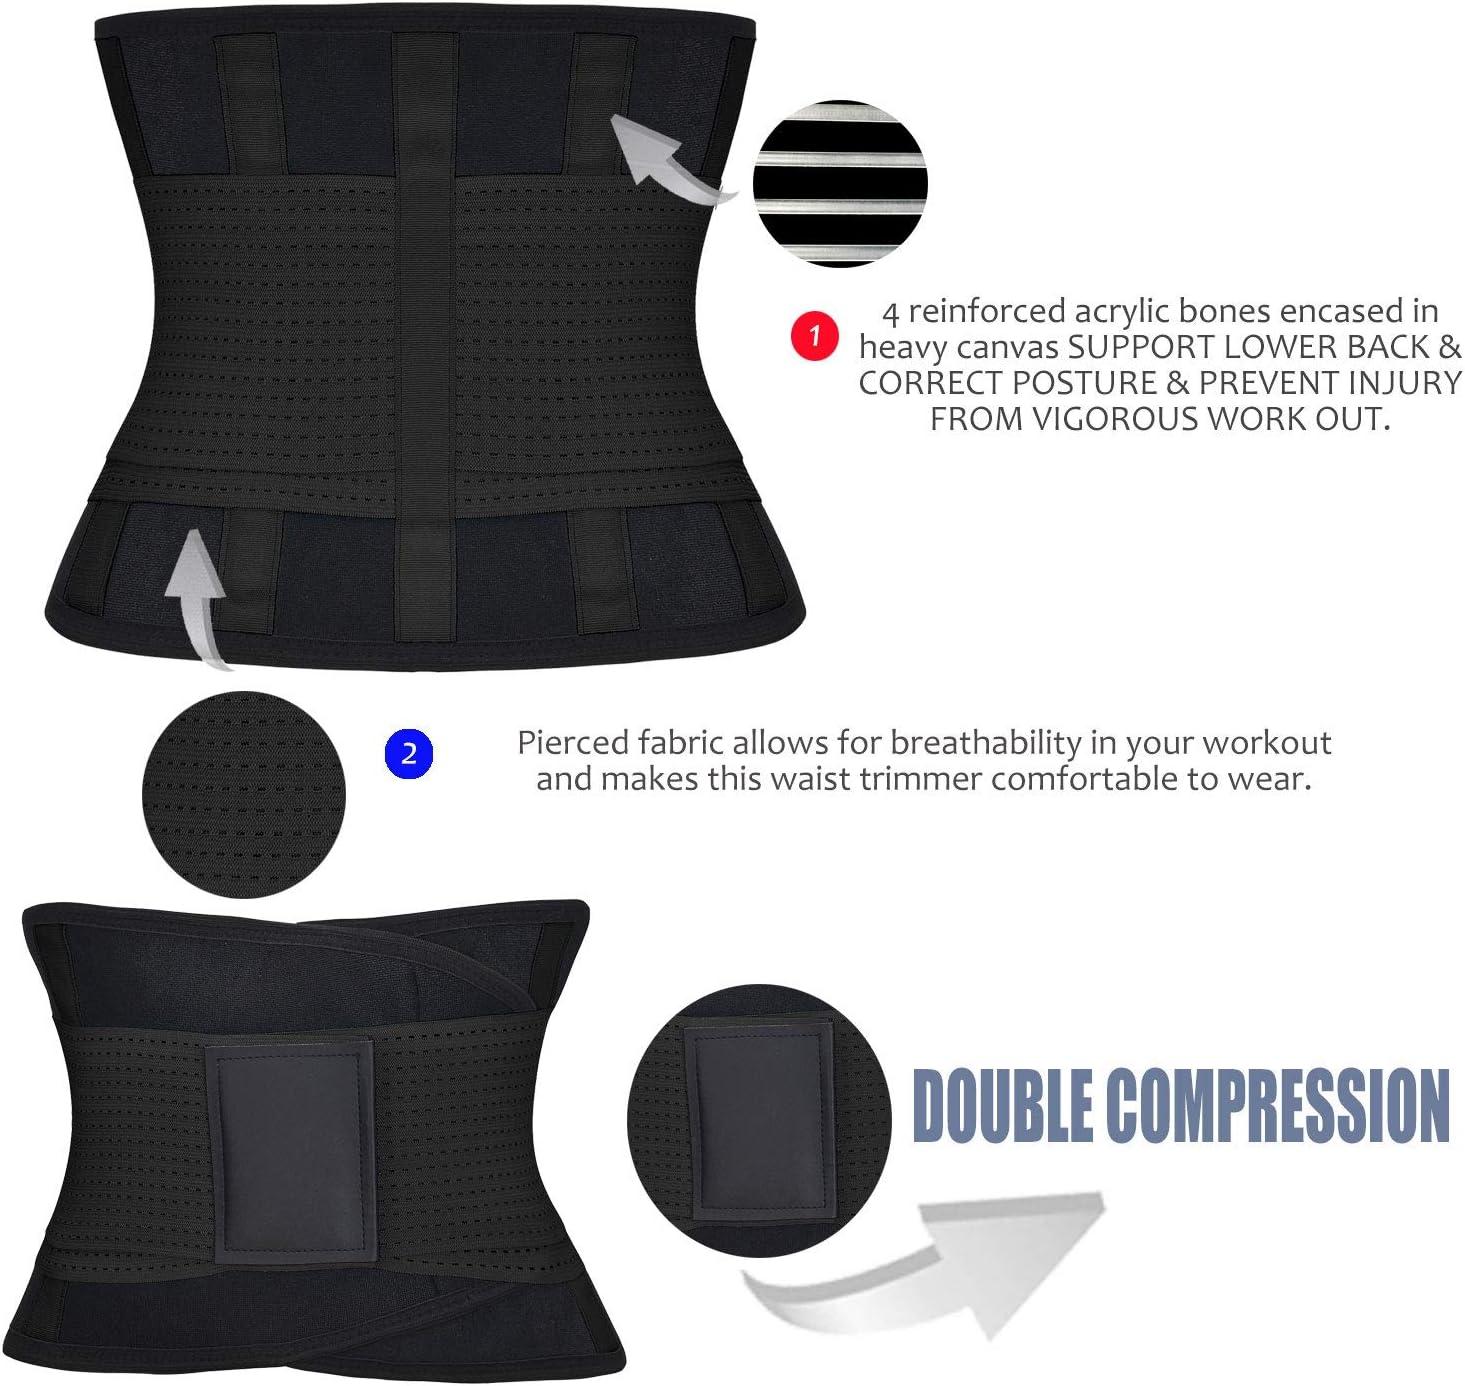 ChongErfei MQC04-BK-M Black Medium 27.7-31.5 Waist